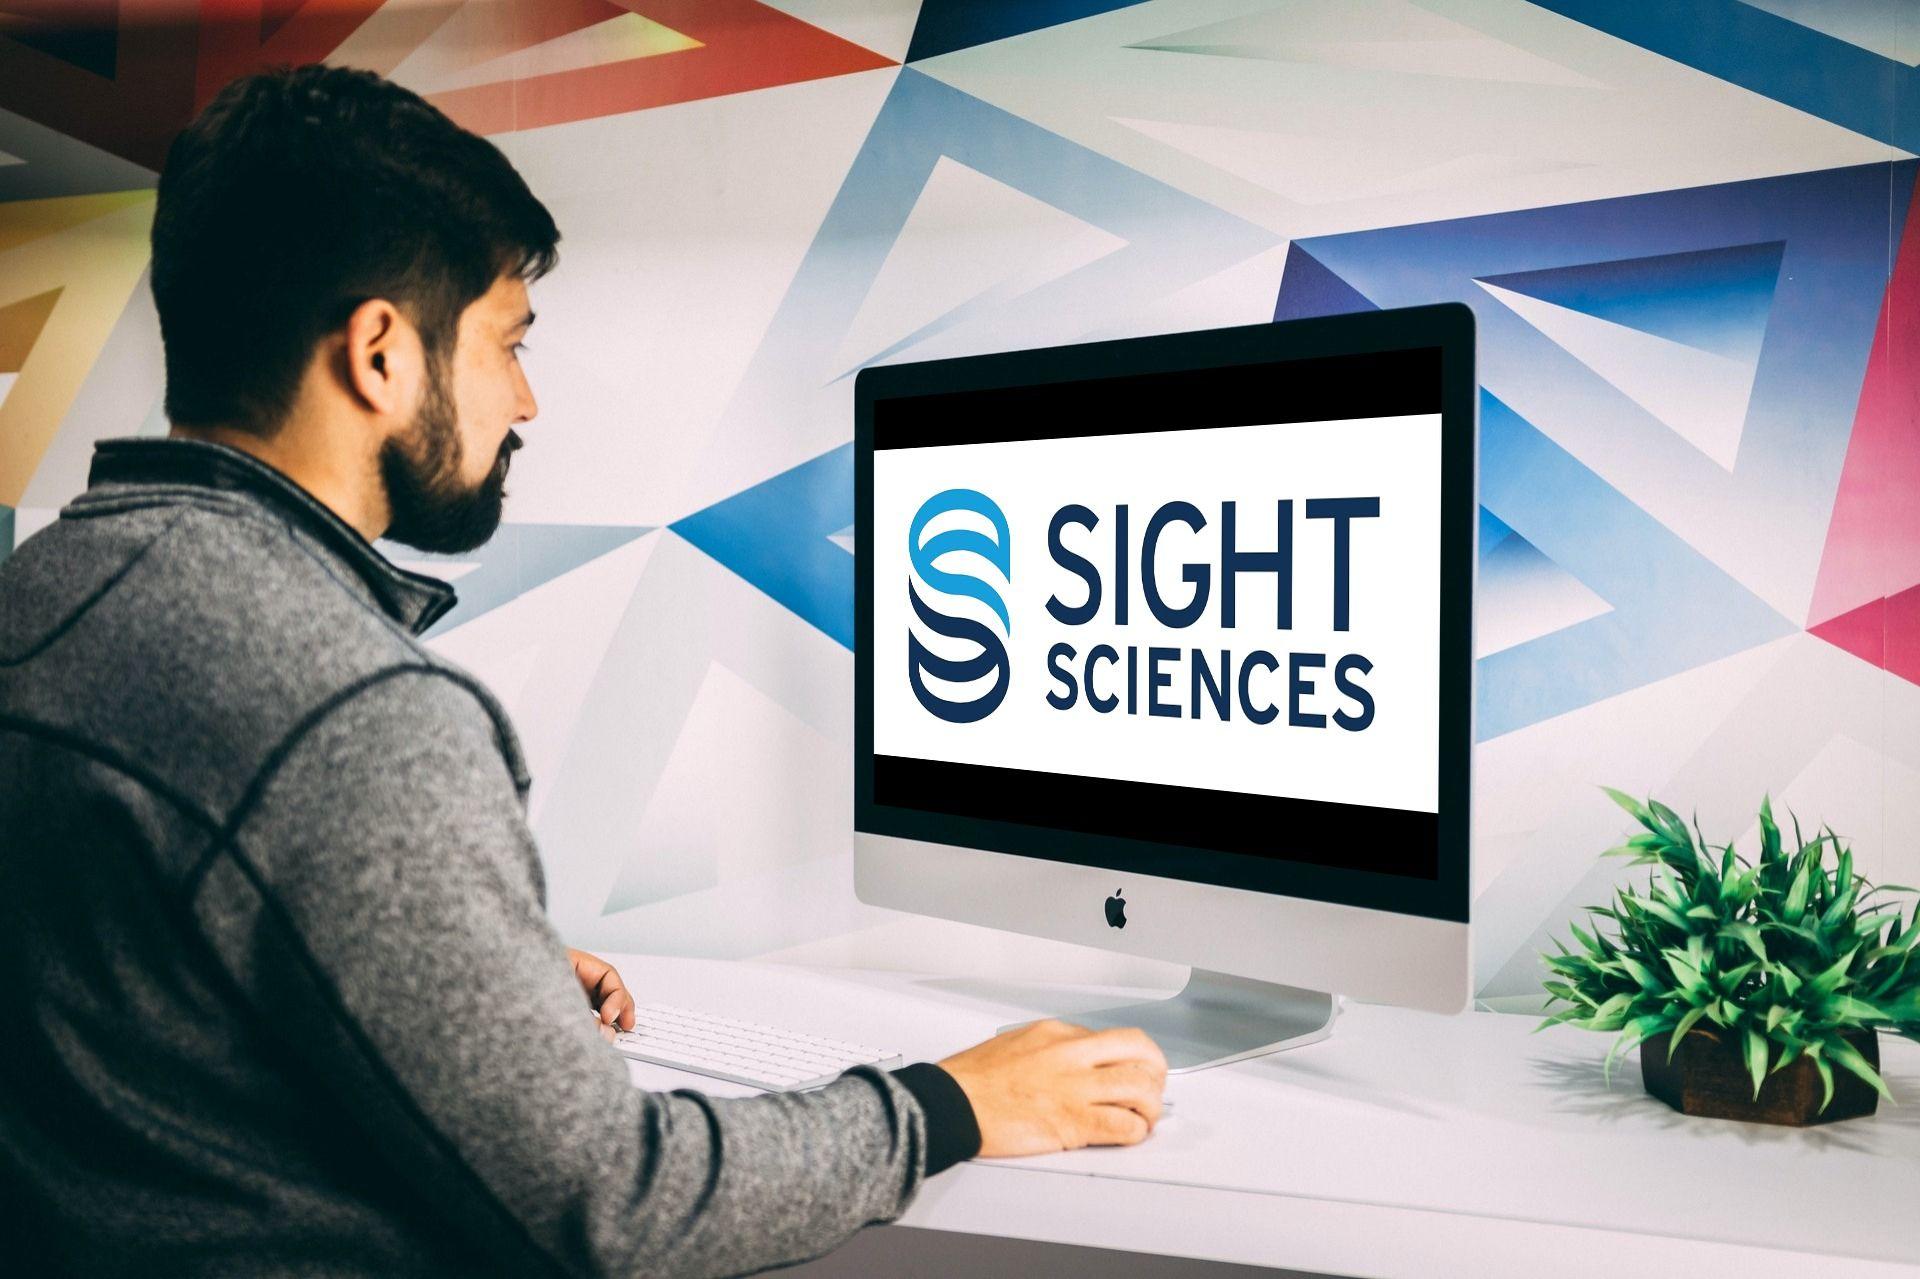 Sight Sciences Initial Public Offering